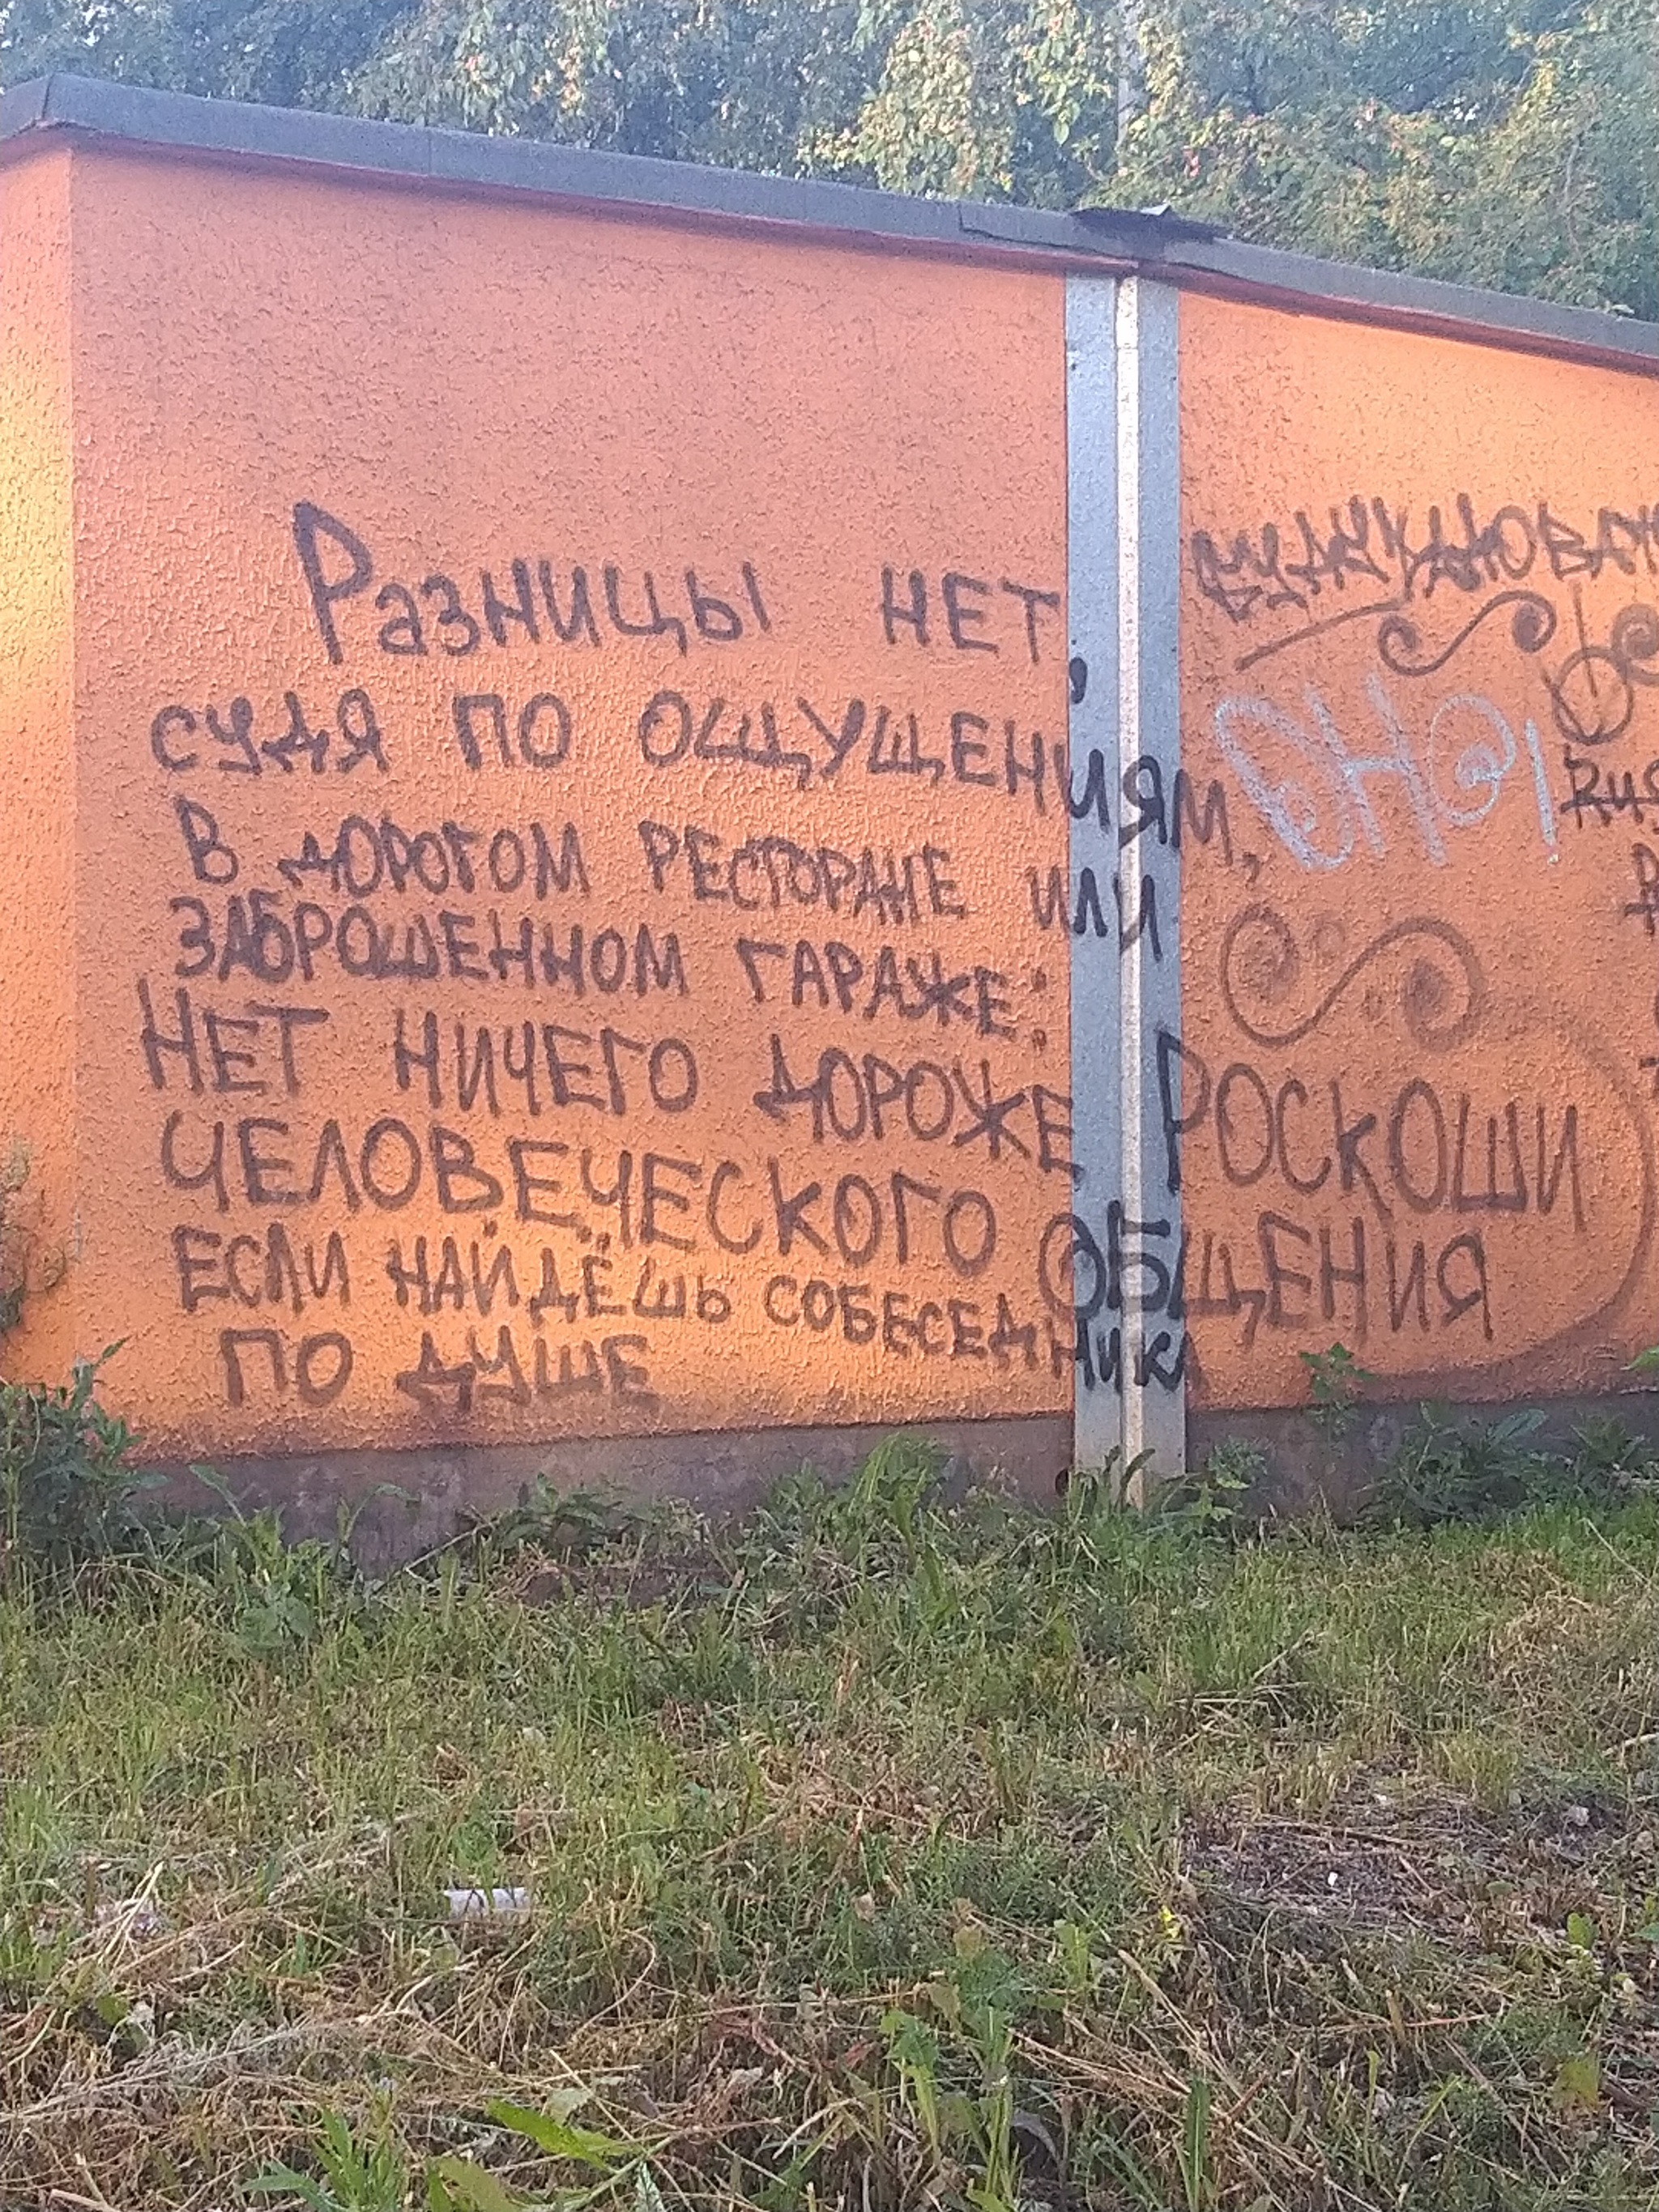 https://cs14.pikabu.ru/post_img/big/2021/10/03/11/1633287855144069183.jpg